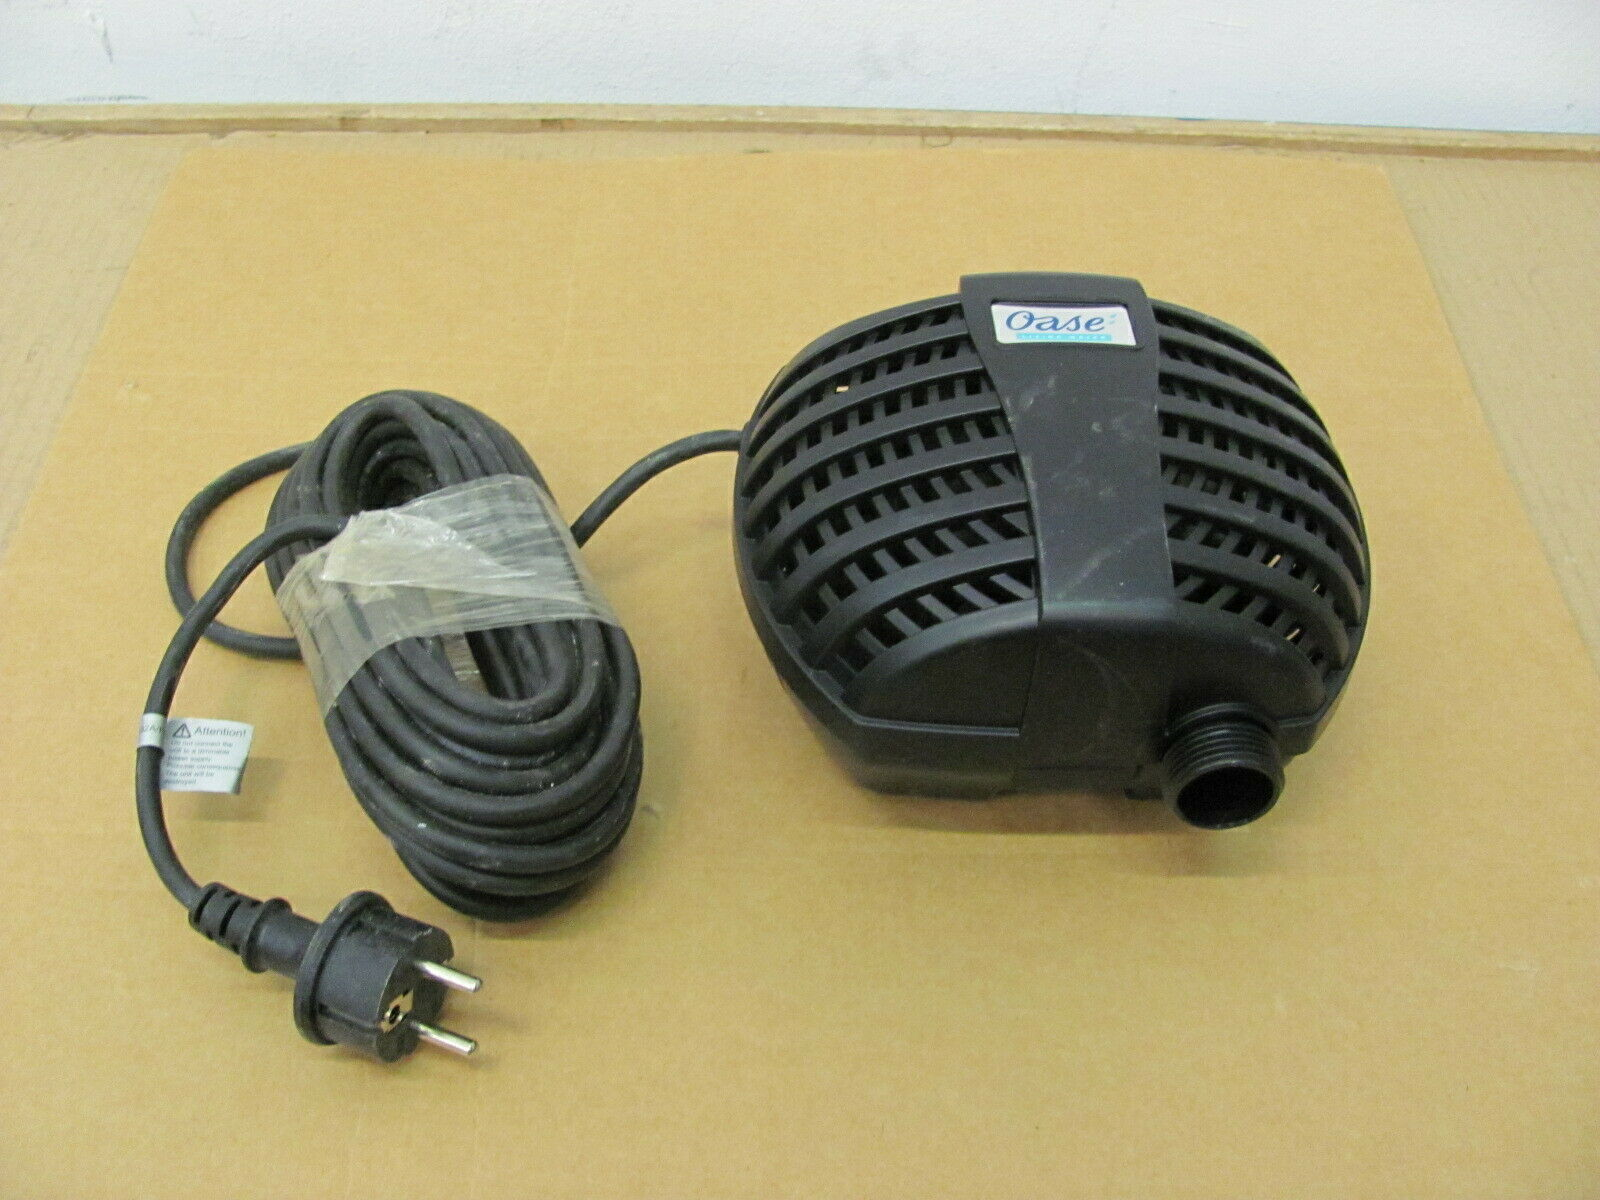 Oase FP 3500   Typ 1655 - Filterpumpe   Teichpumpe   Ersatzpumpe   Pumpe